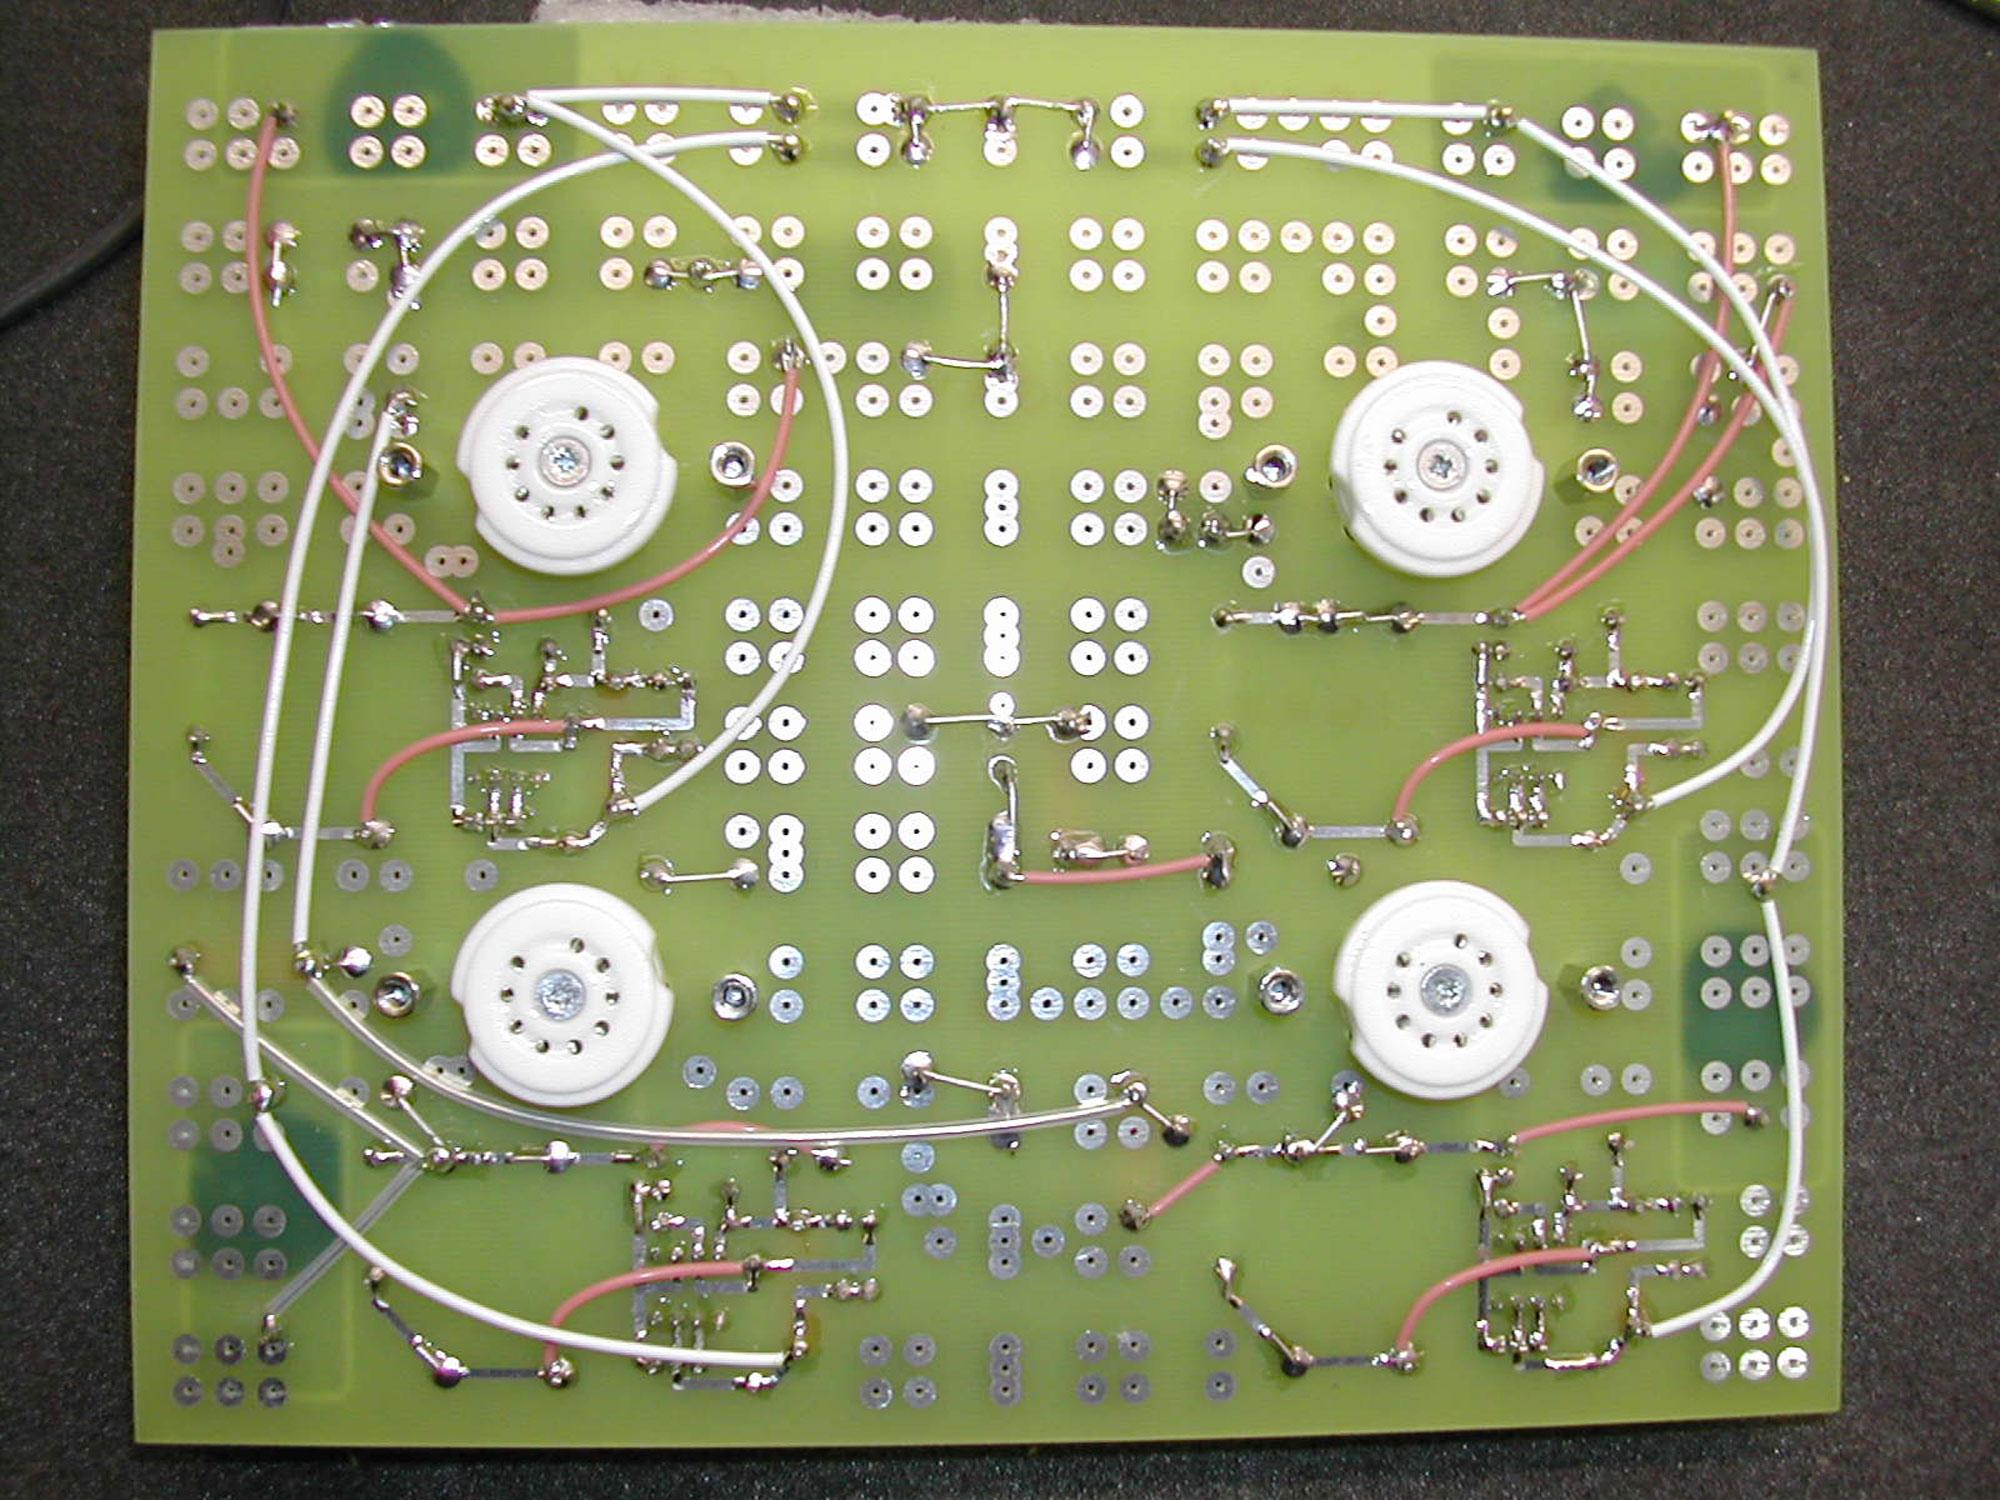 quattro-hard-wiring.jpg